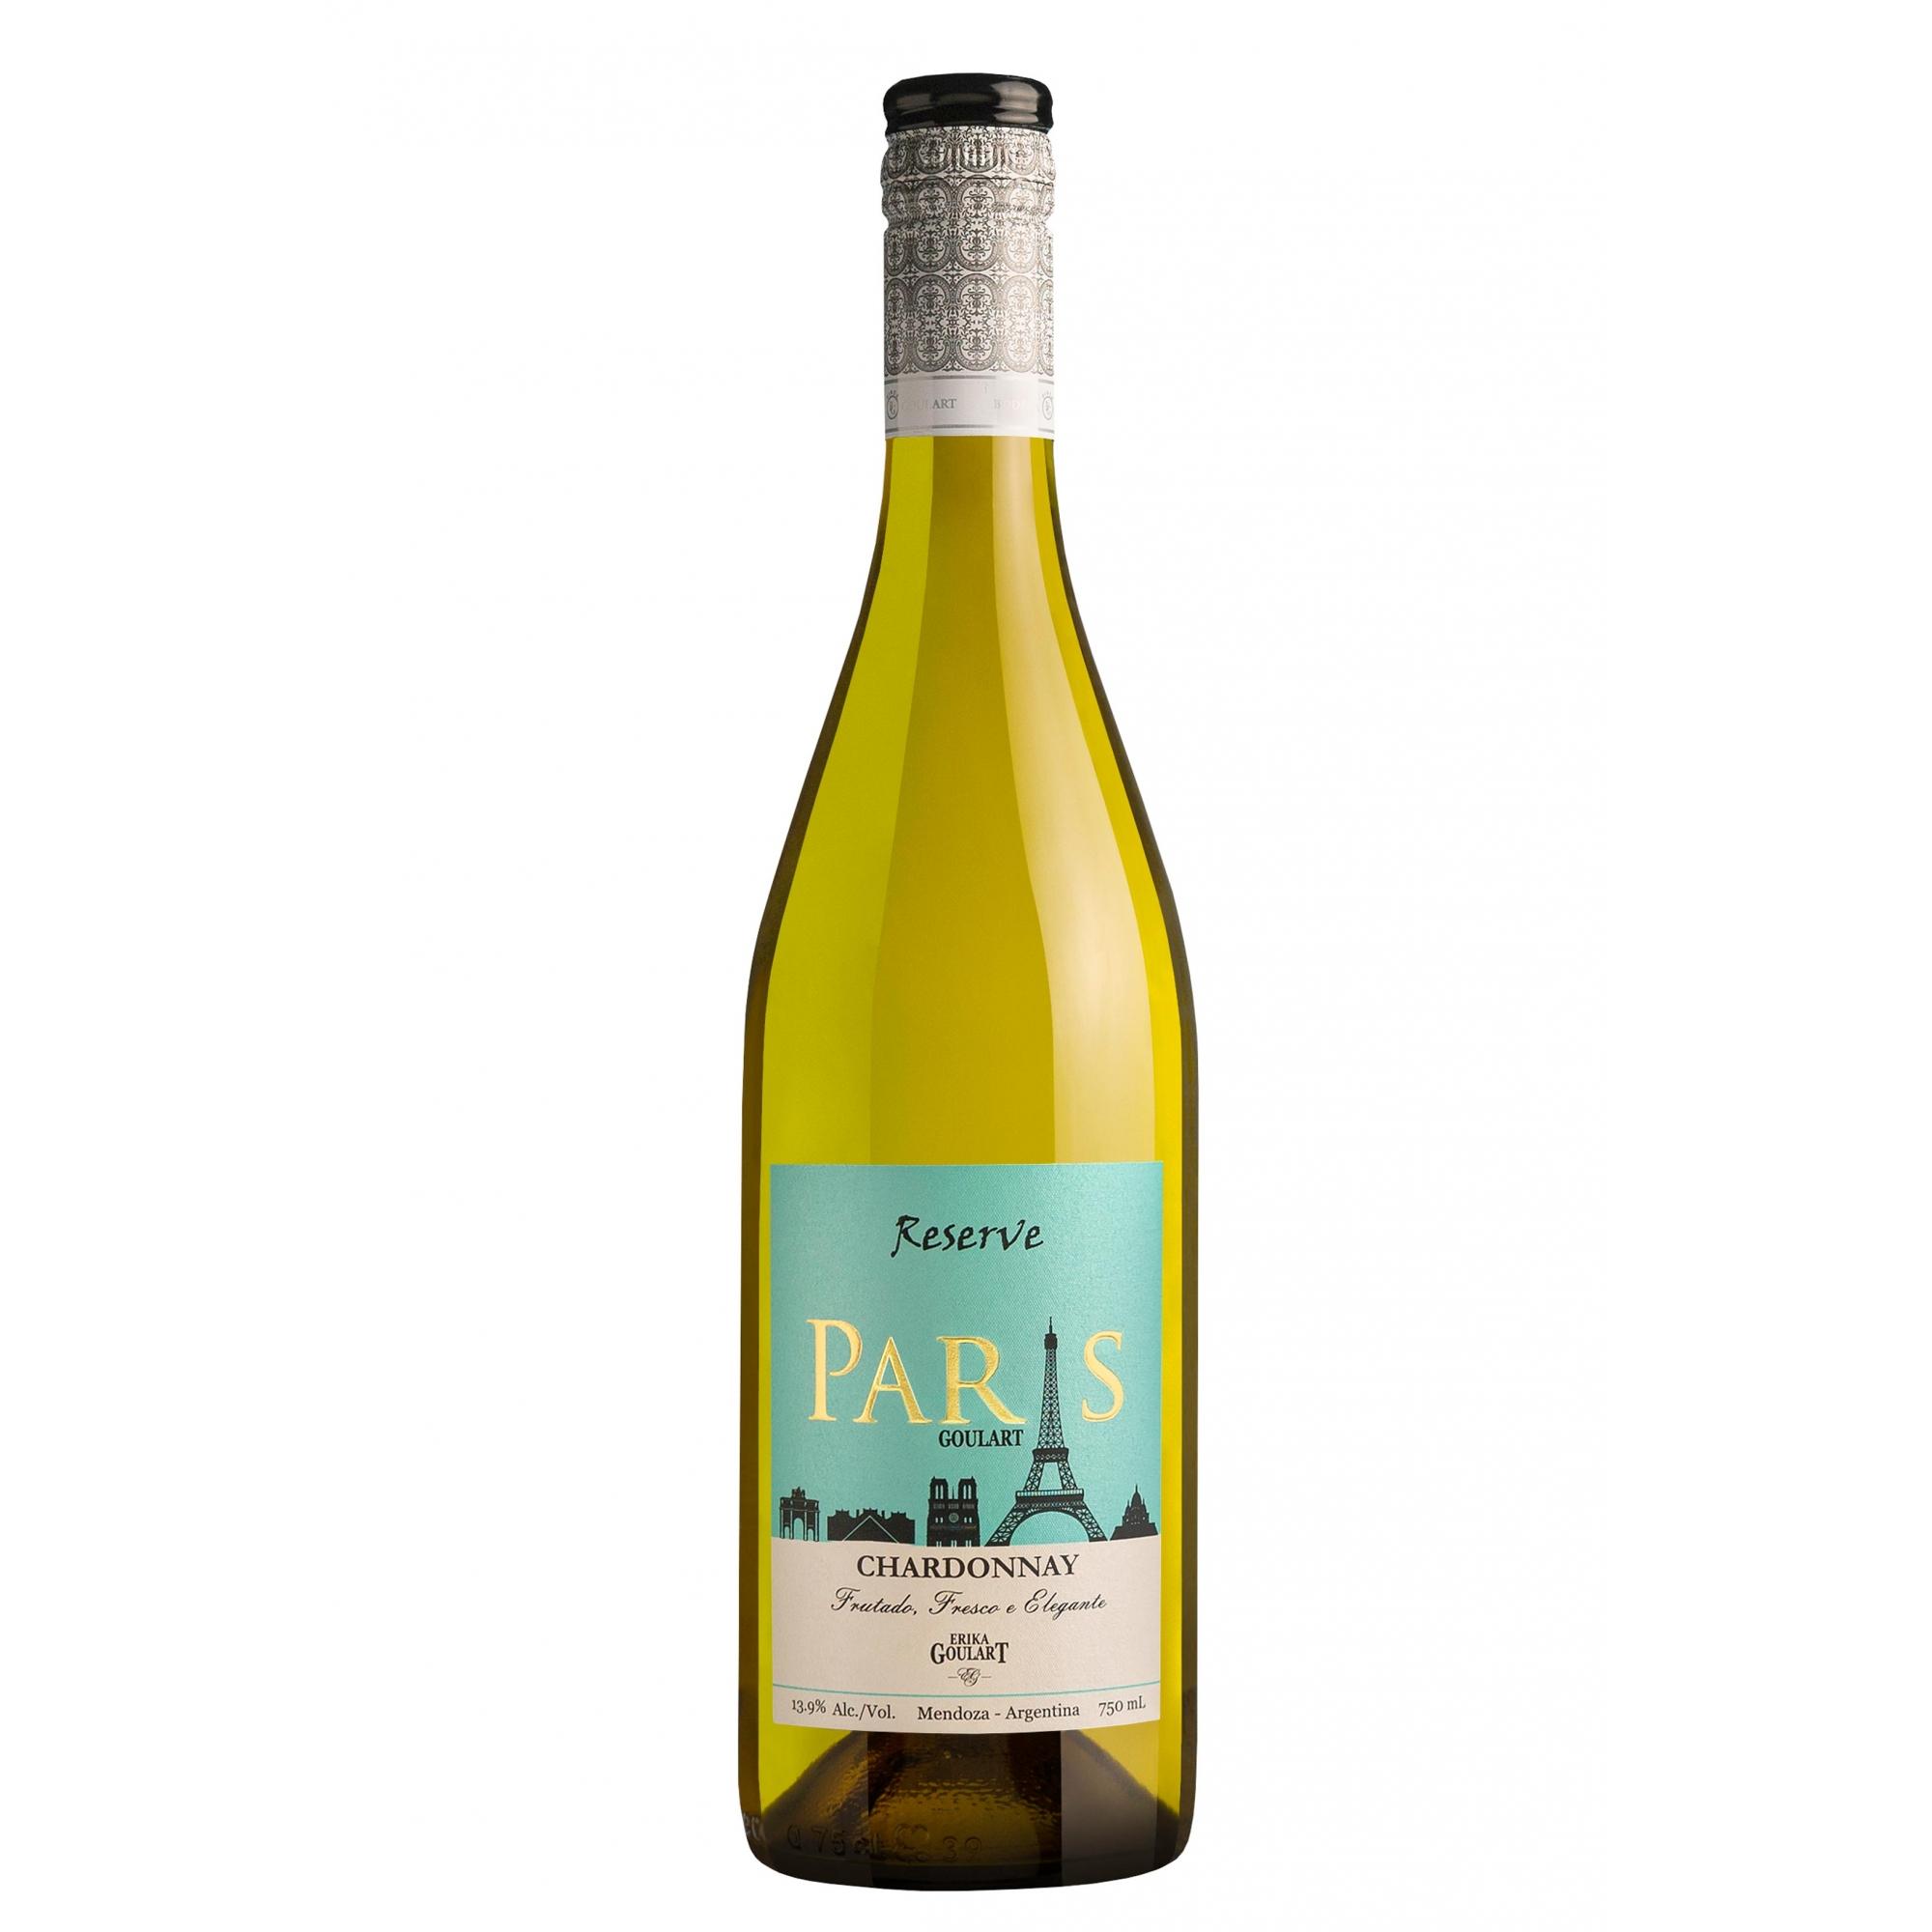 Paris Goulart Reserve Chardonnay 2020 - 750ml